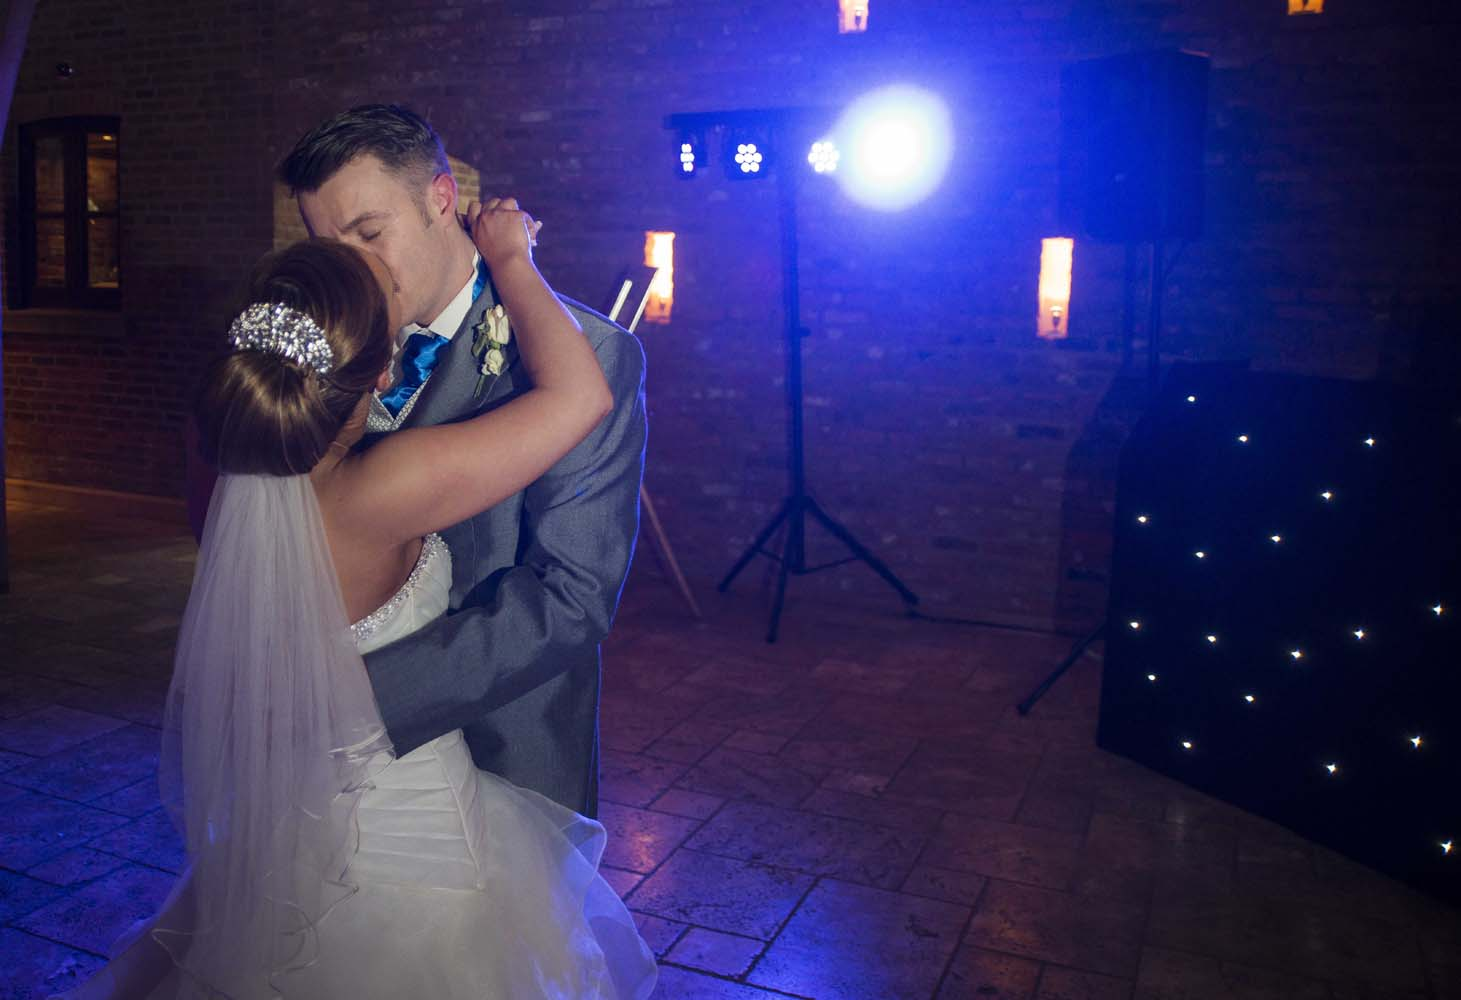 wedding photo 11 (23 of 30).jpg .jpg